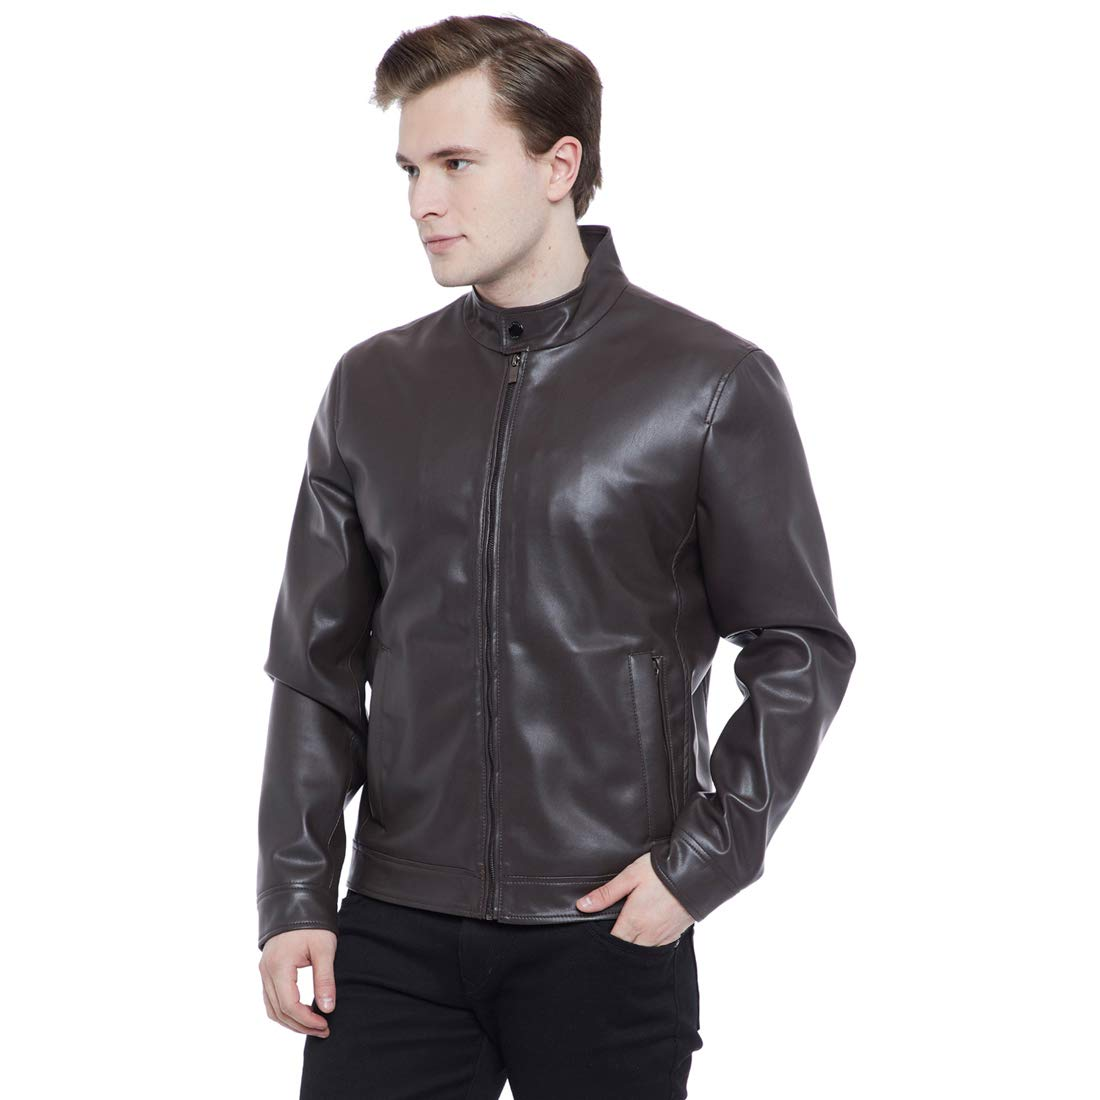 d3a01d5c0 Guy Laroche Men's Jacket: Amazon.in: Clothing & Accessories